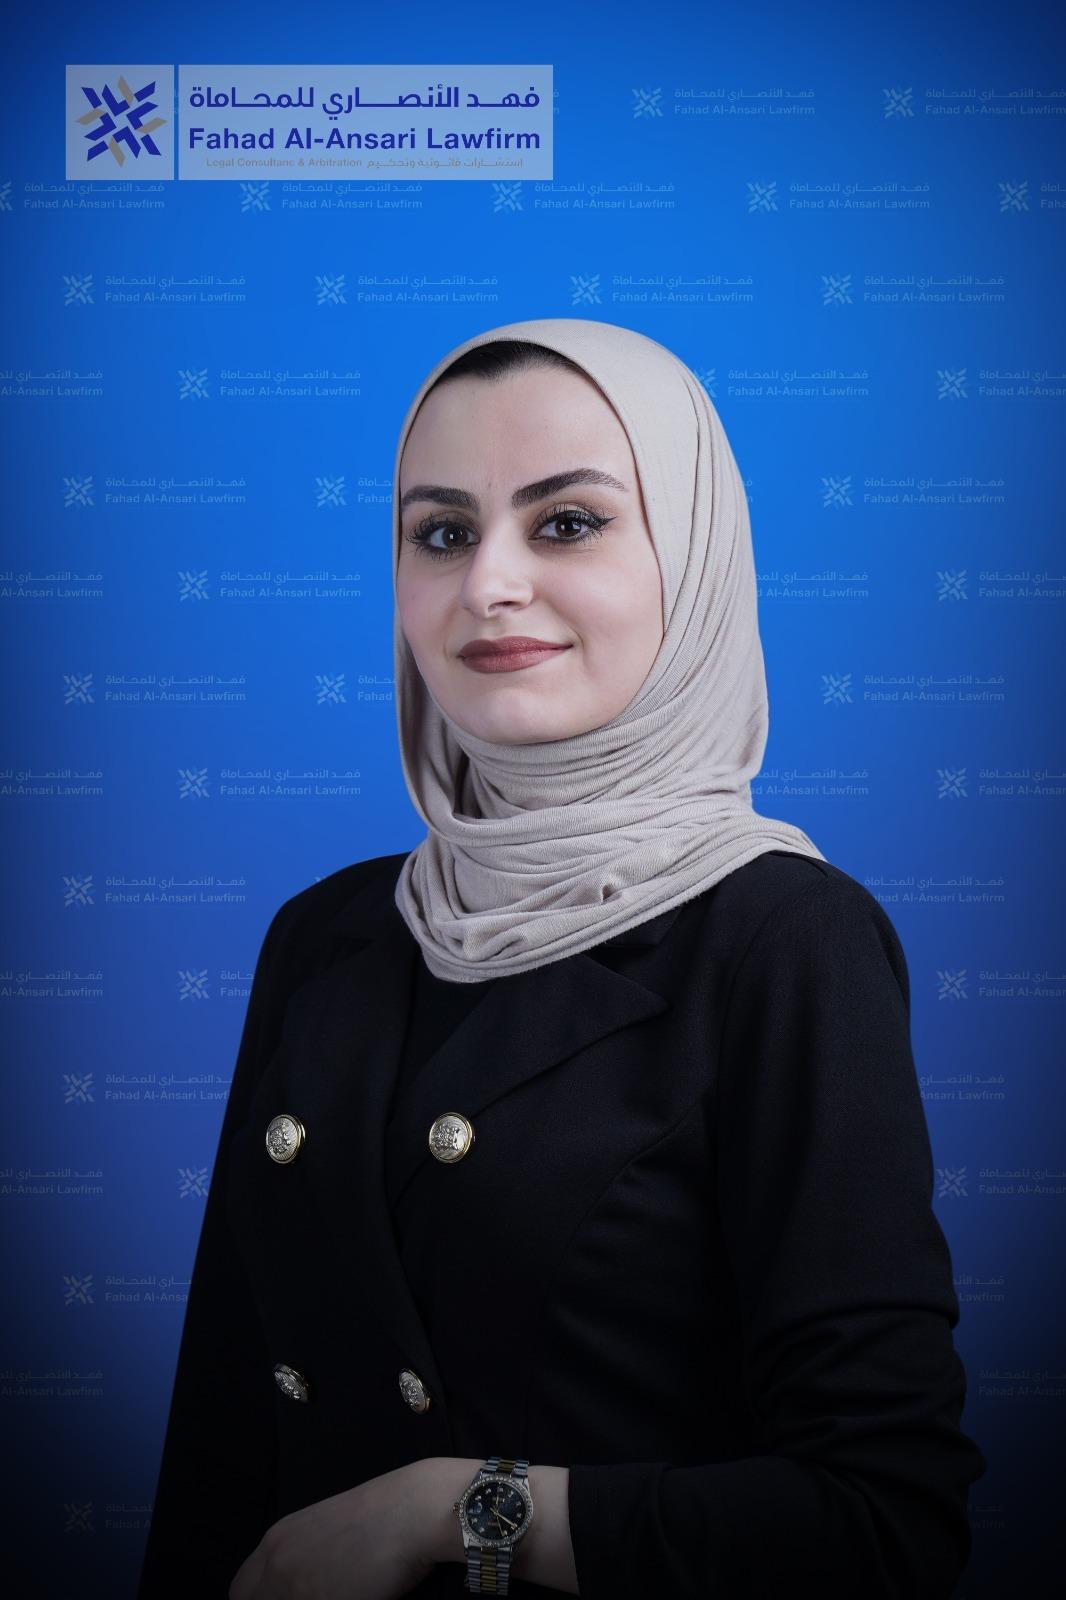 Maram Fawzat Nemer